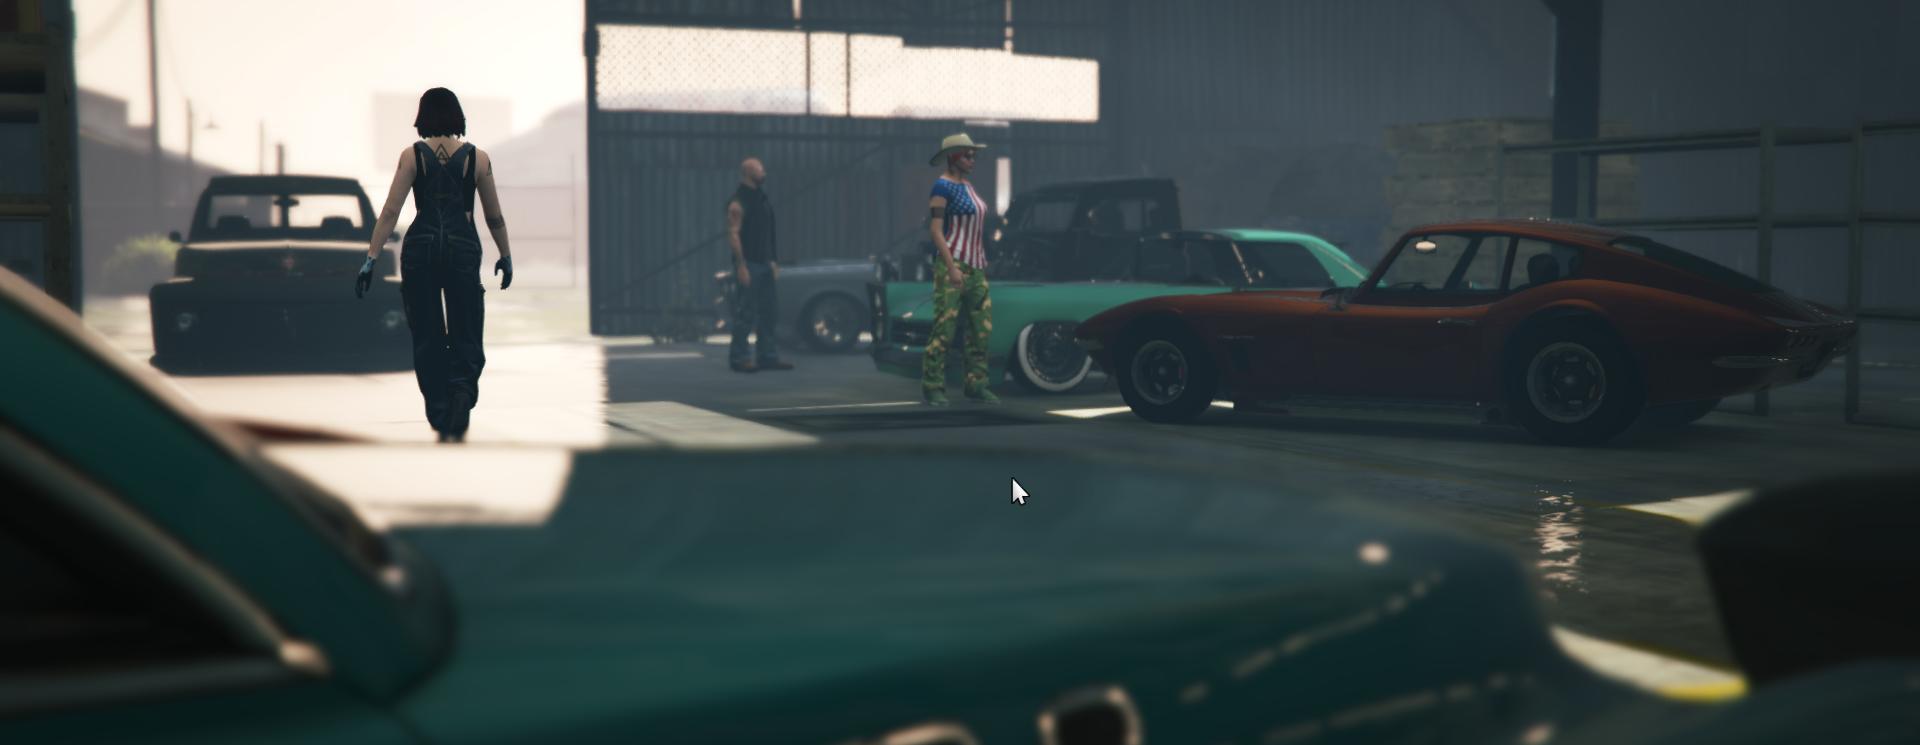 Grand_Theft_Auto_V_04_04_2018_17_23_15_2